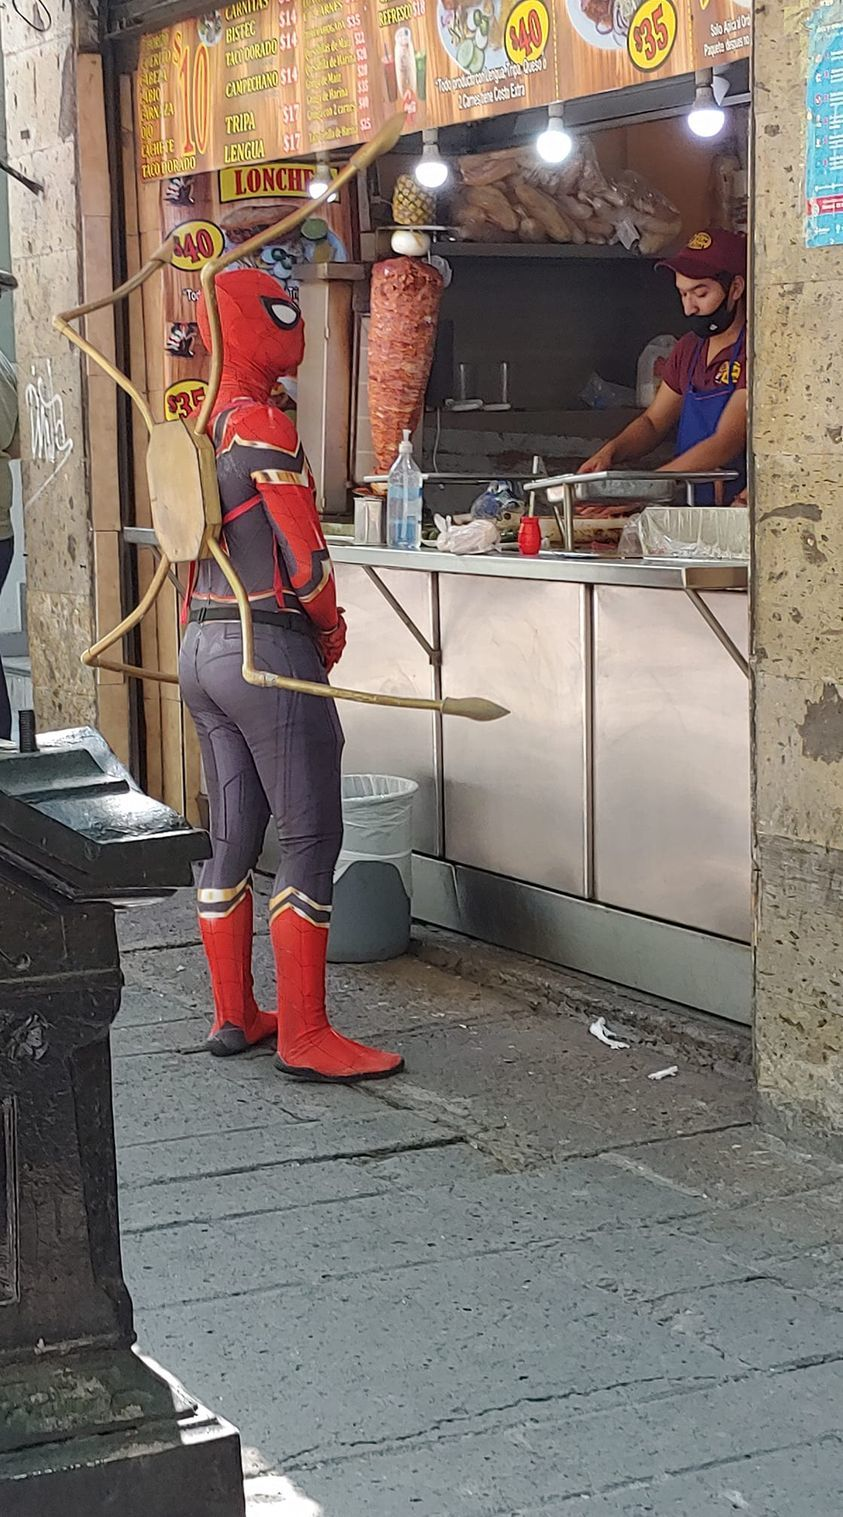 Yo cuando sea spiderman - meme